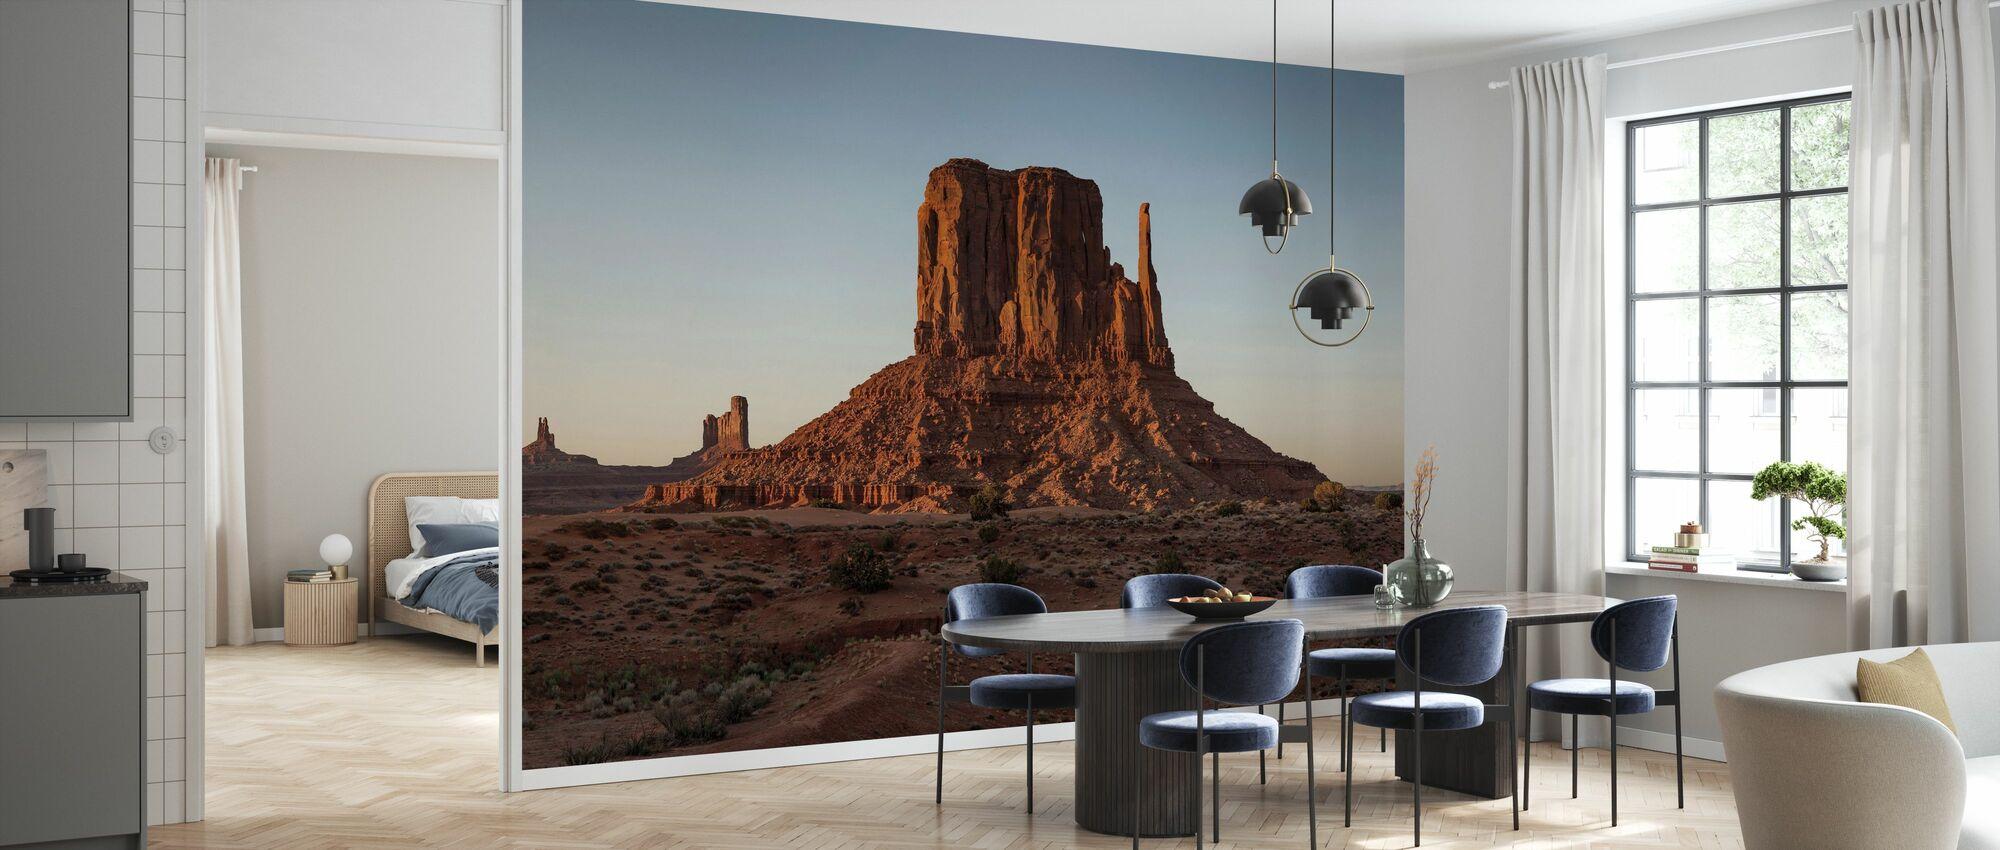 Scenic Landscape - Wallpaper - Kitchen